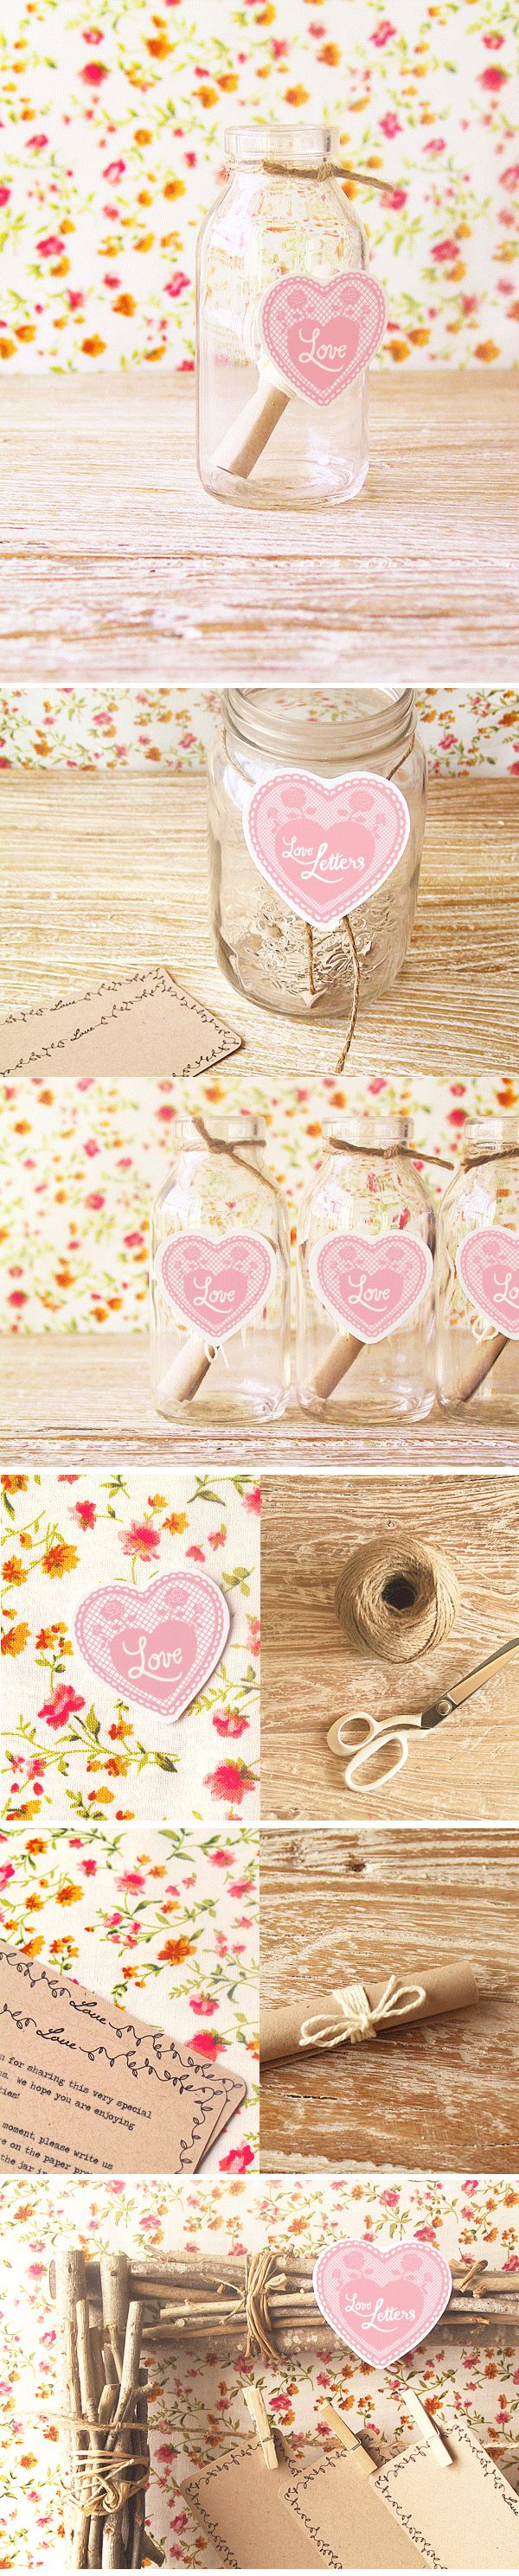 DIY Wedding Love Notes. #Wedding #Gift #Craft #Homemade #Love #Ideas